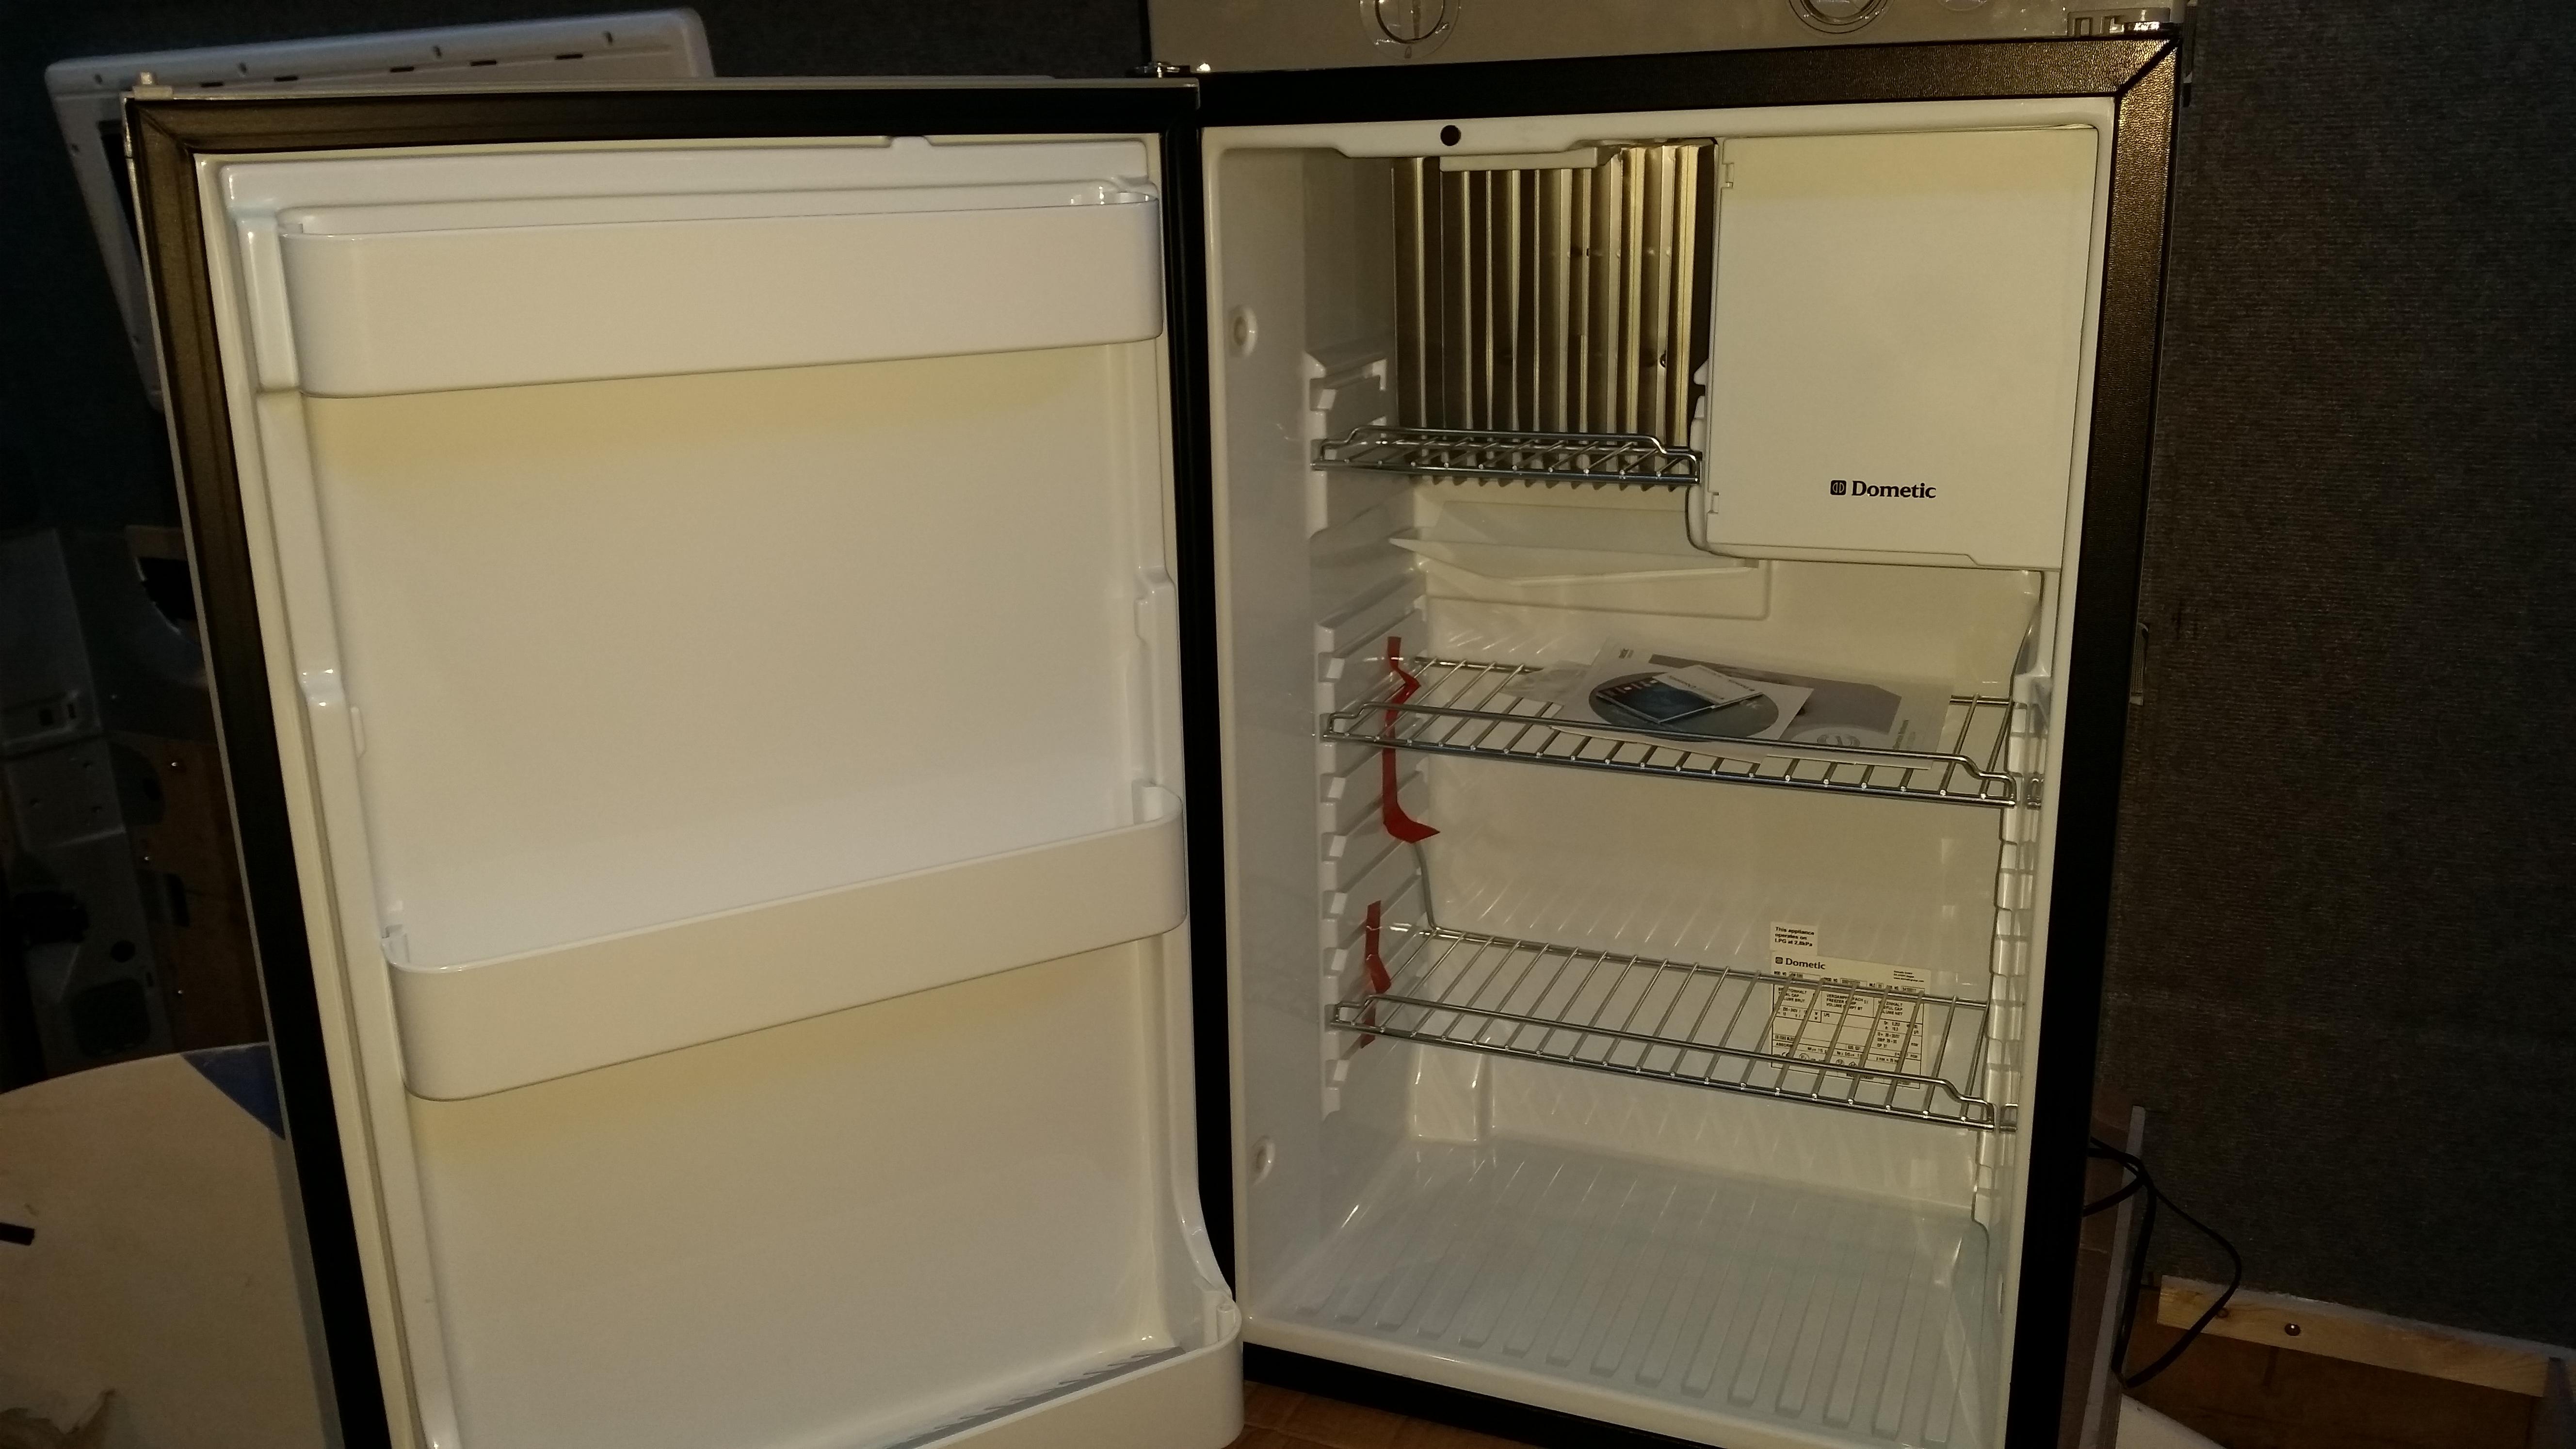 Kühlschrank Dometic : Schieber tÜrverriegelung dometic kühlschrank grau serie